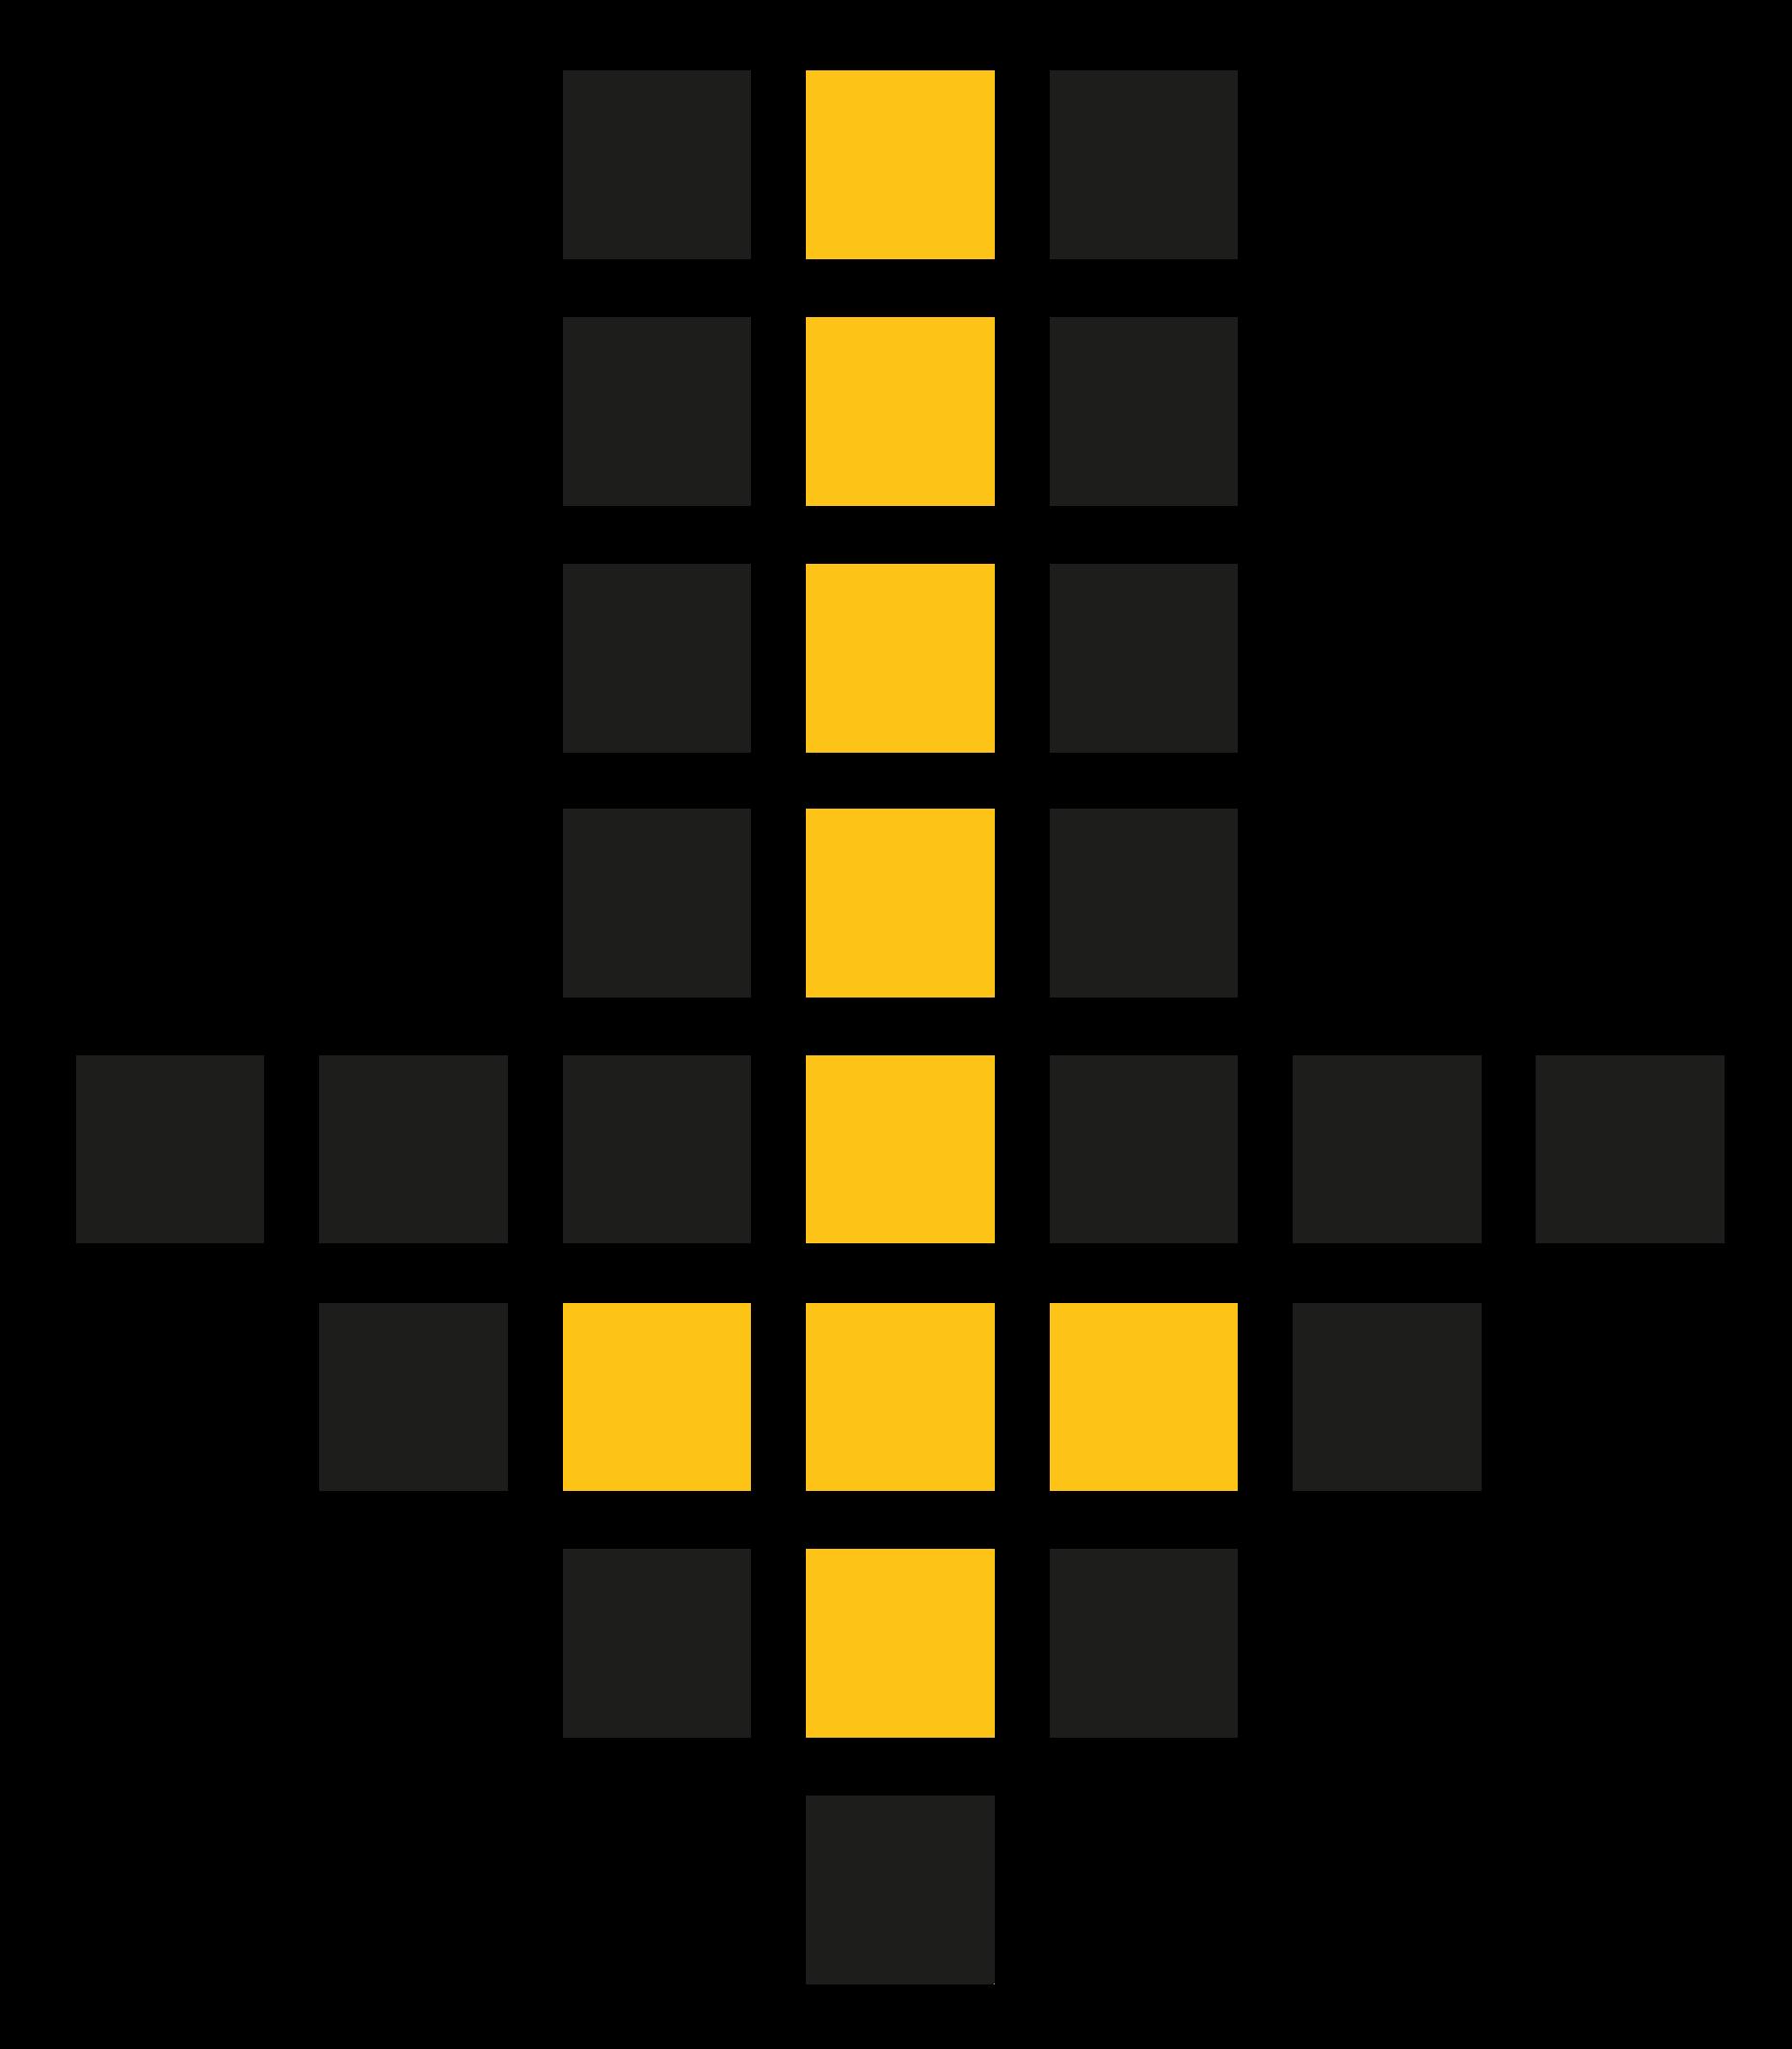 flecha-negra-amarilla-abajo-gala-formacion